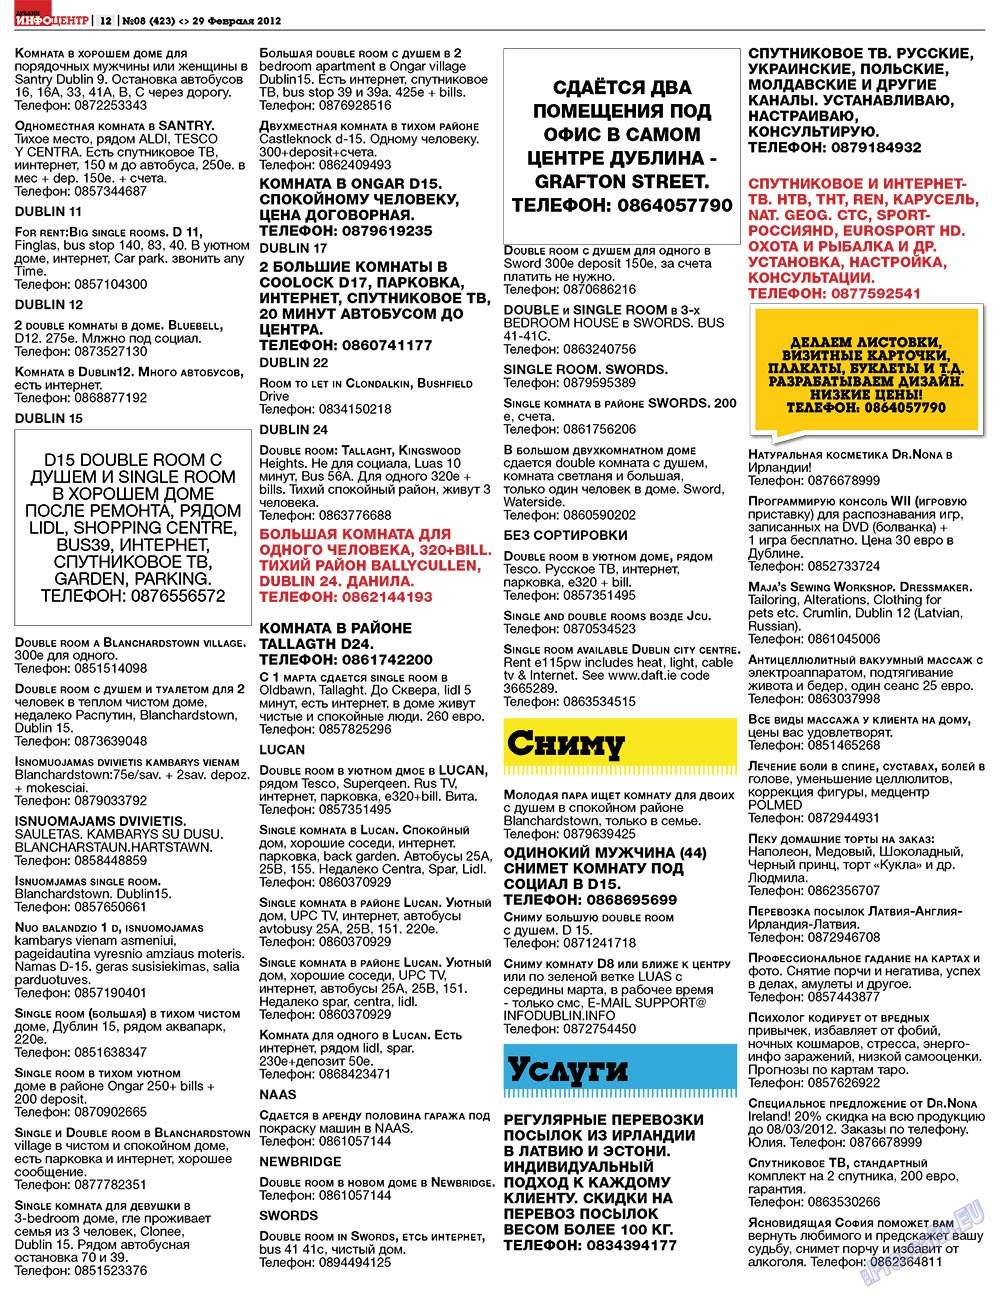 Дублин инфоцентр (газета). 2012 год, номер 8, стр. 12